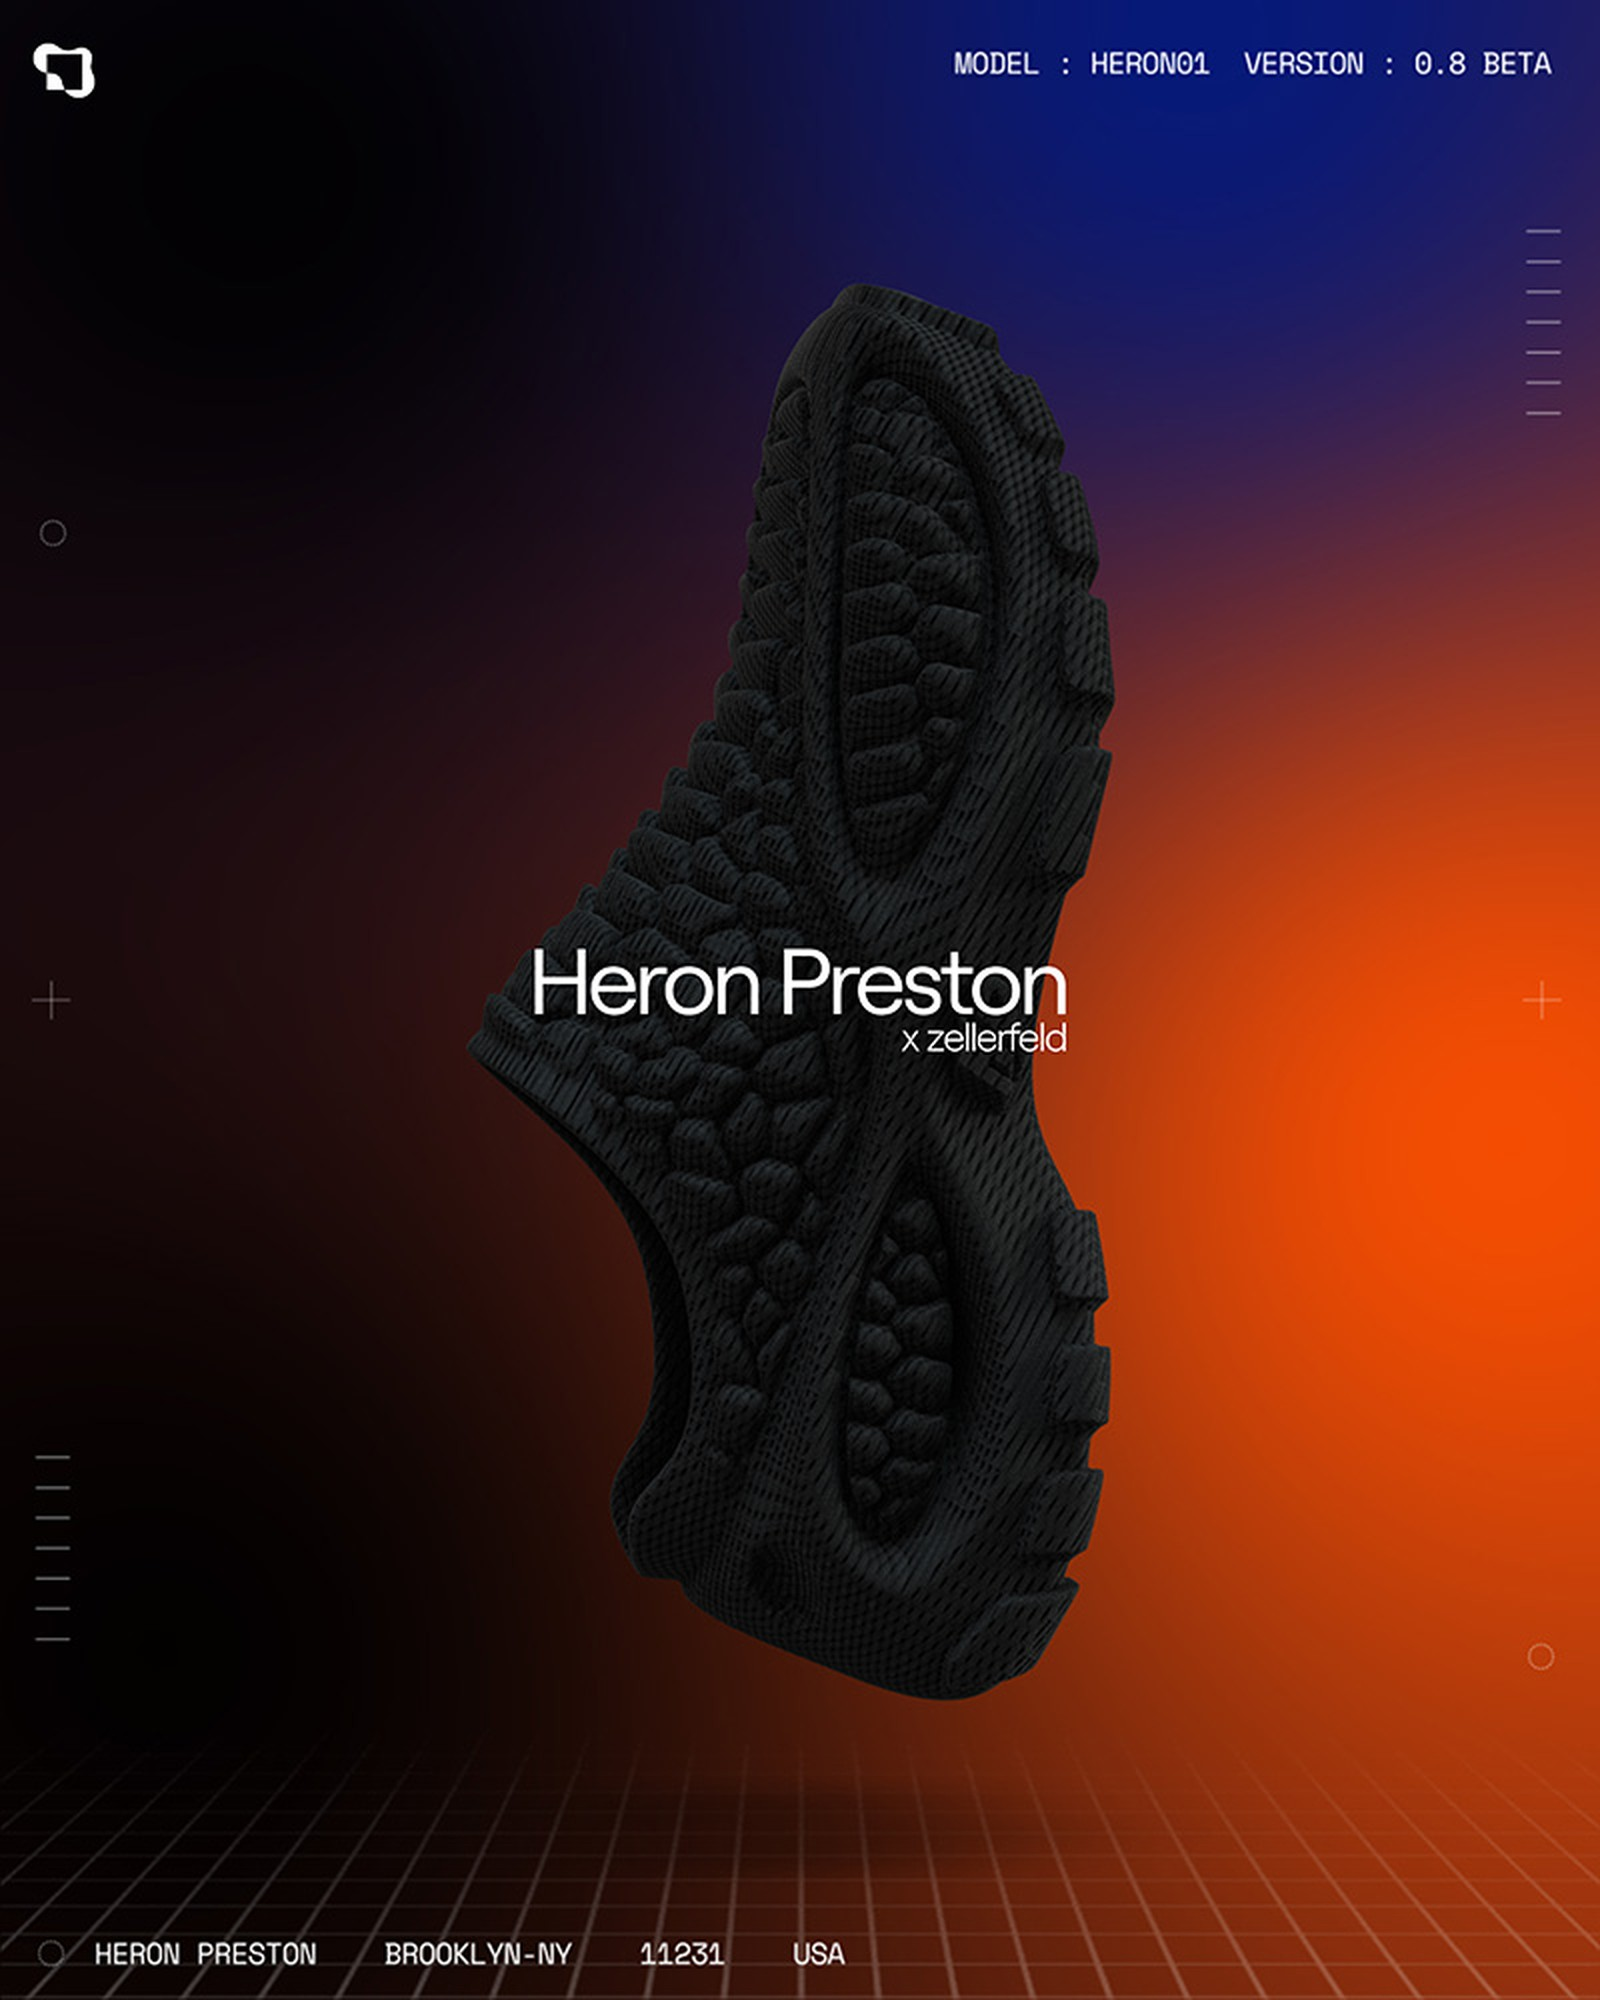 heron-preston-zellerfeld-dtf-magazine-04